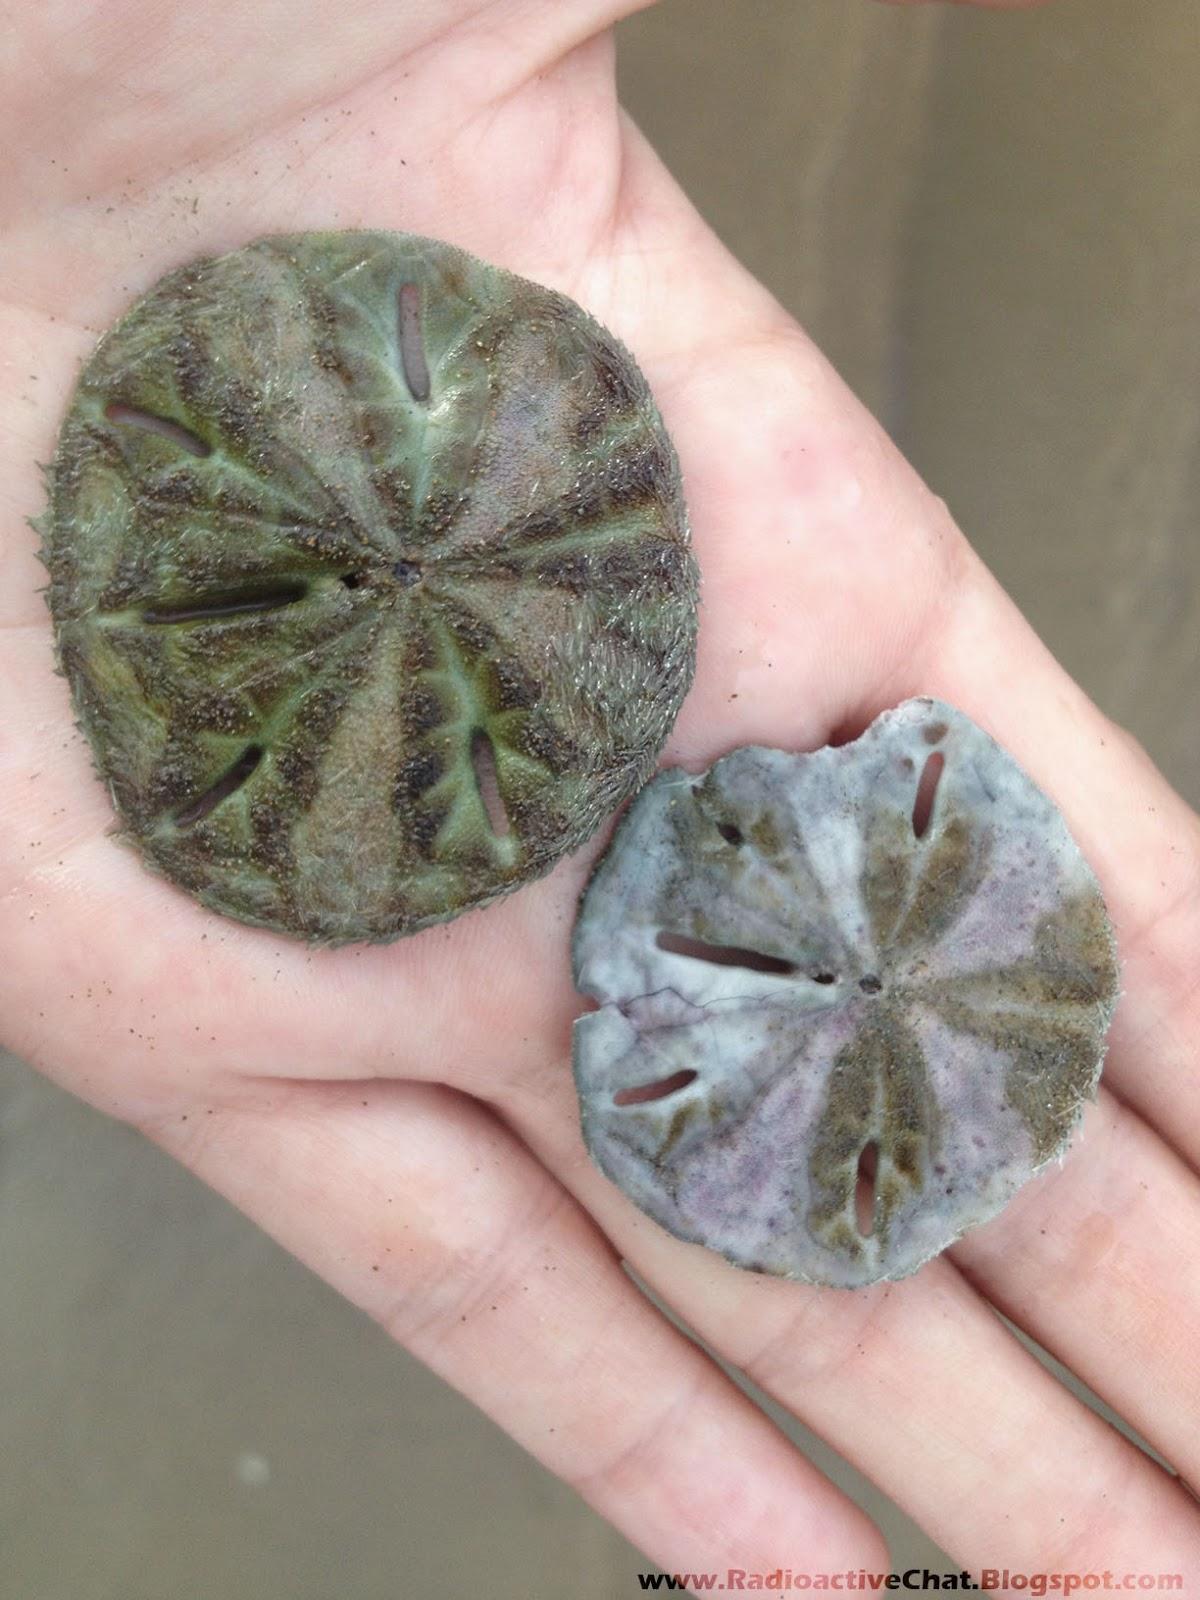 Severe Genetic Mutations Sand Dollars Costa Rica - Photo 2-1